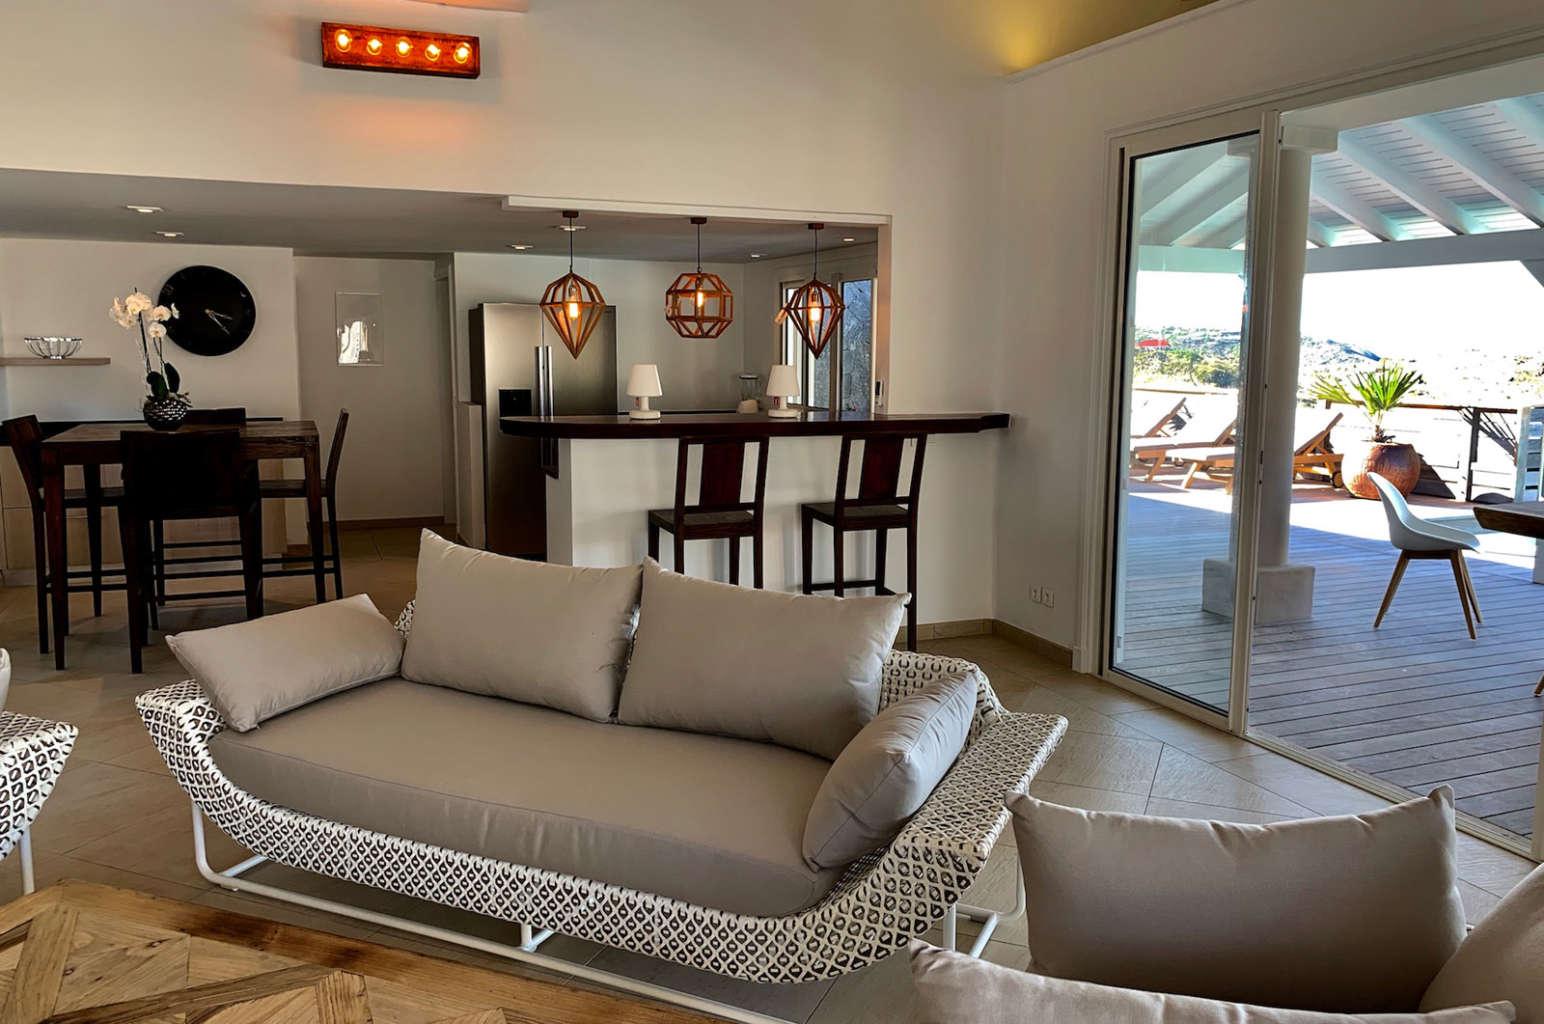 Villa Lagon Rose - Spacious Villa Rental St Barth Petit Cul De Sac with Beautiful Sea View - Living room